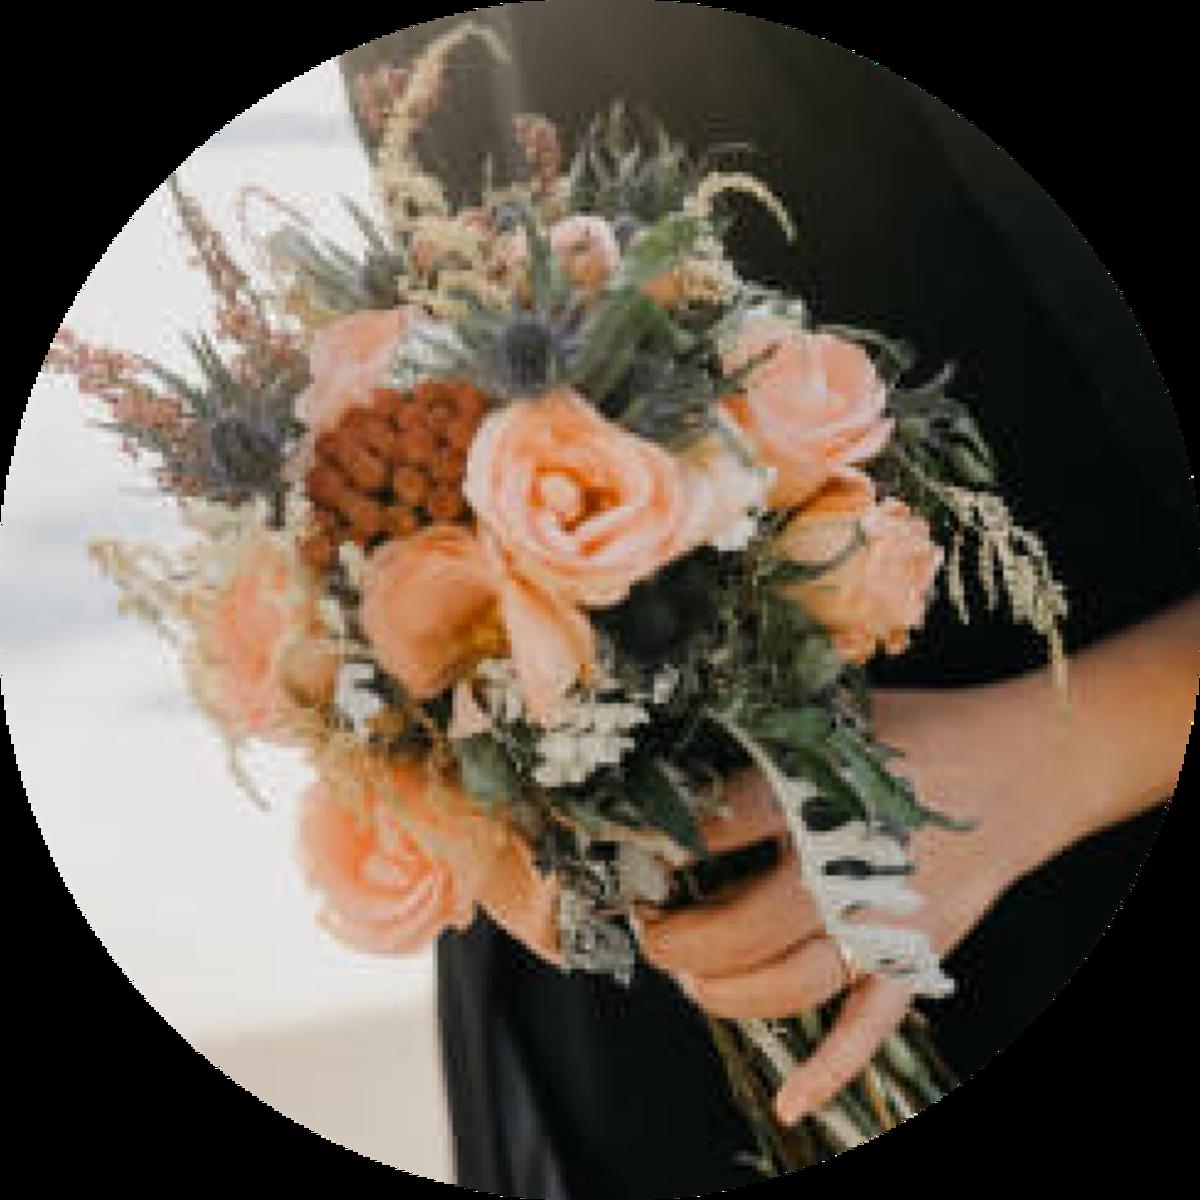 Miami Wedding Venues | Newport Beachside Hotel & Resort